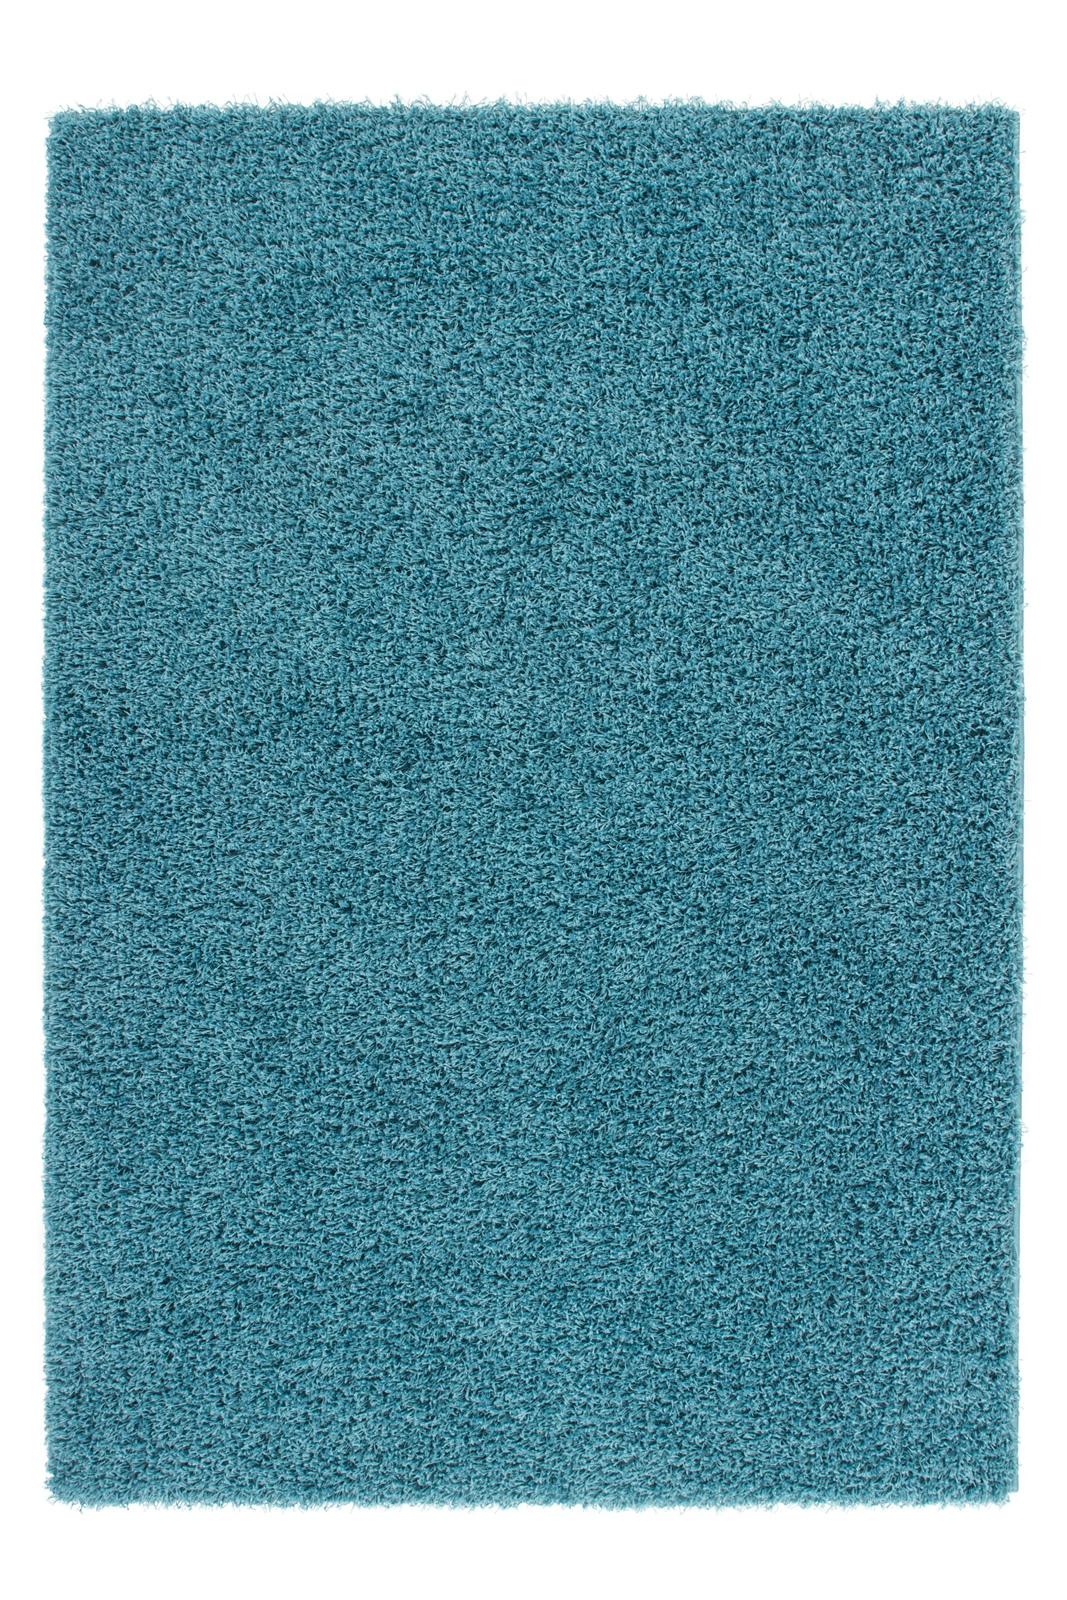 Lalee koberce Kusový koberec Relax REL 150 blue - 80x150 cm